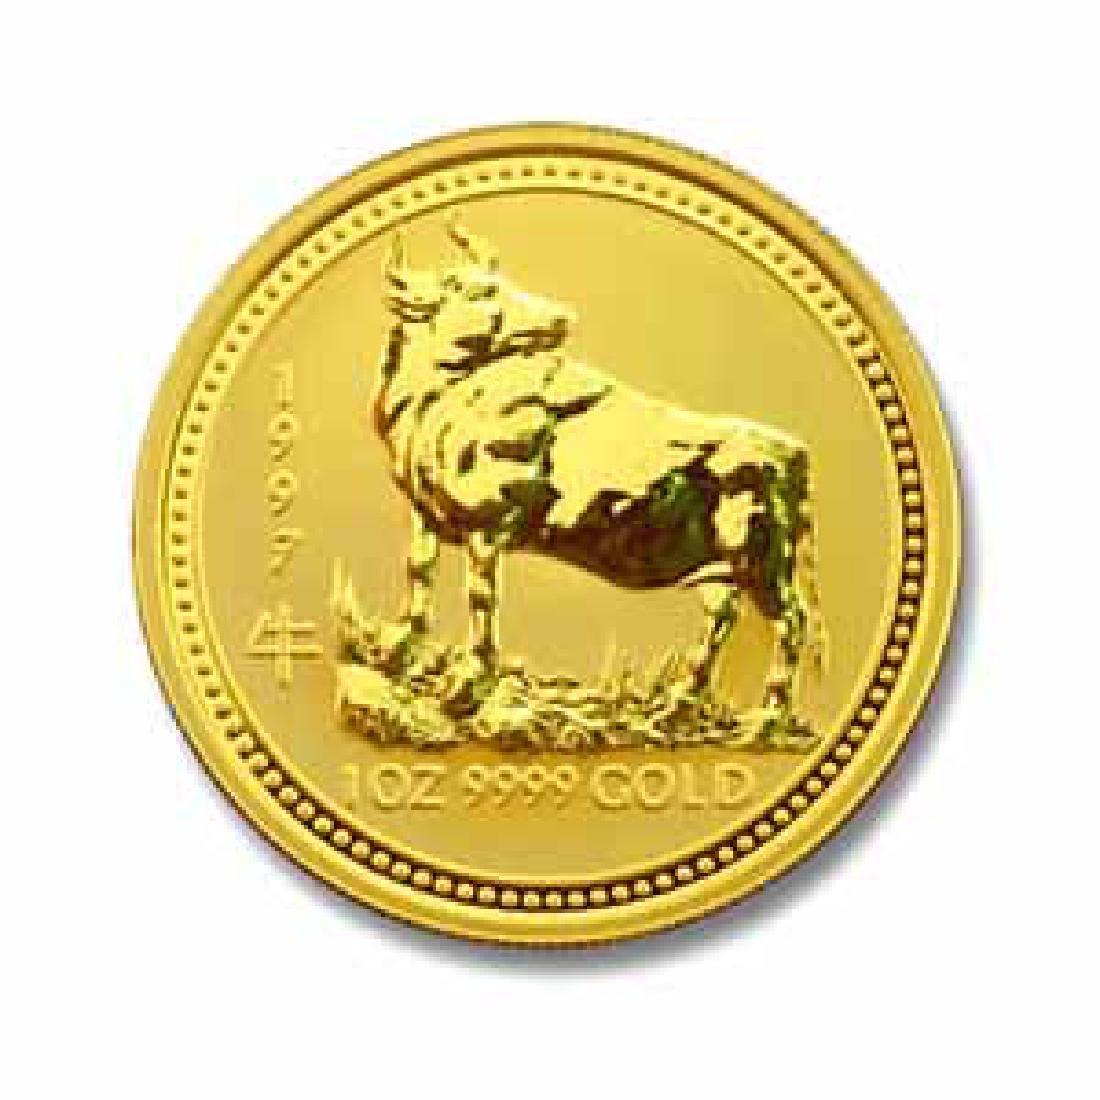 1997 Australia 1 oz Gold Lunar Ox